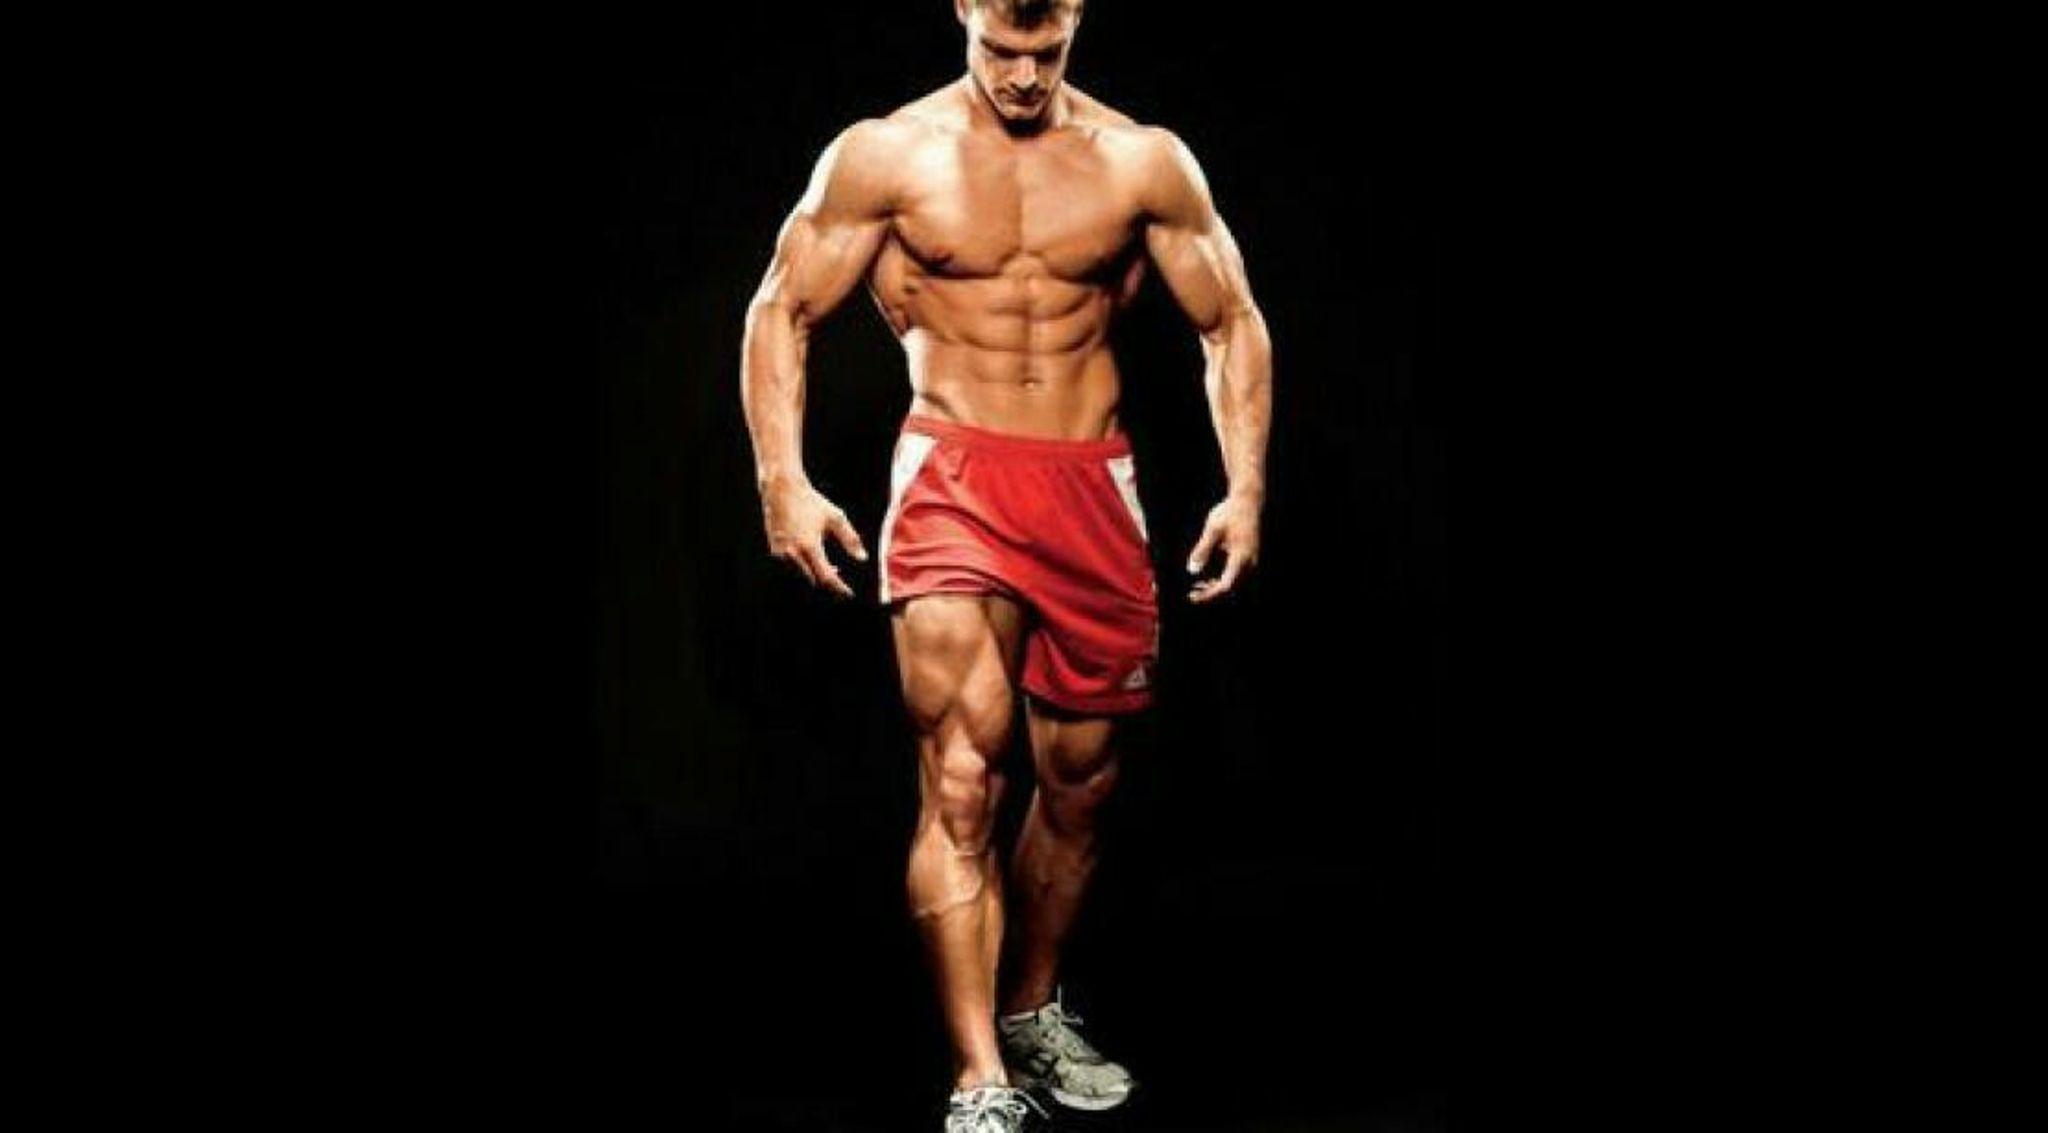 Muscle women wearing chaps pron photo